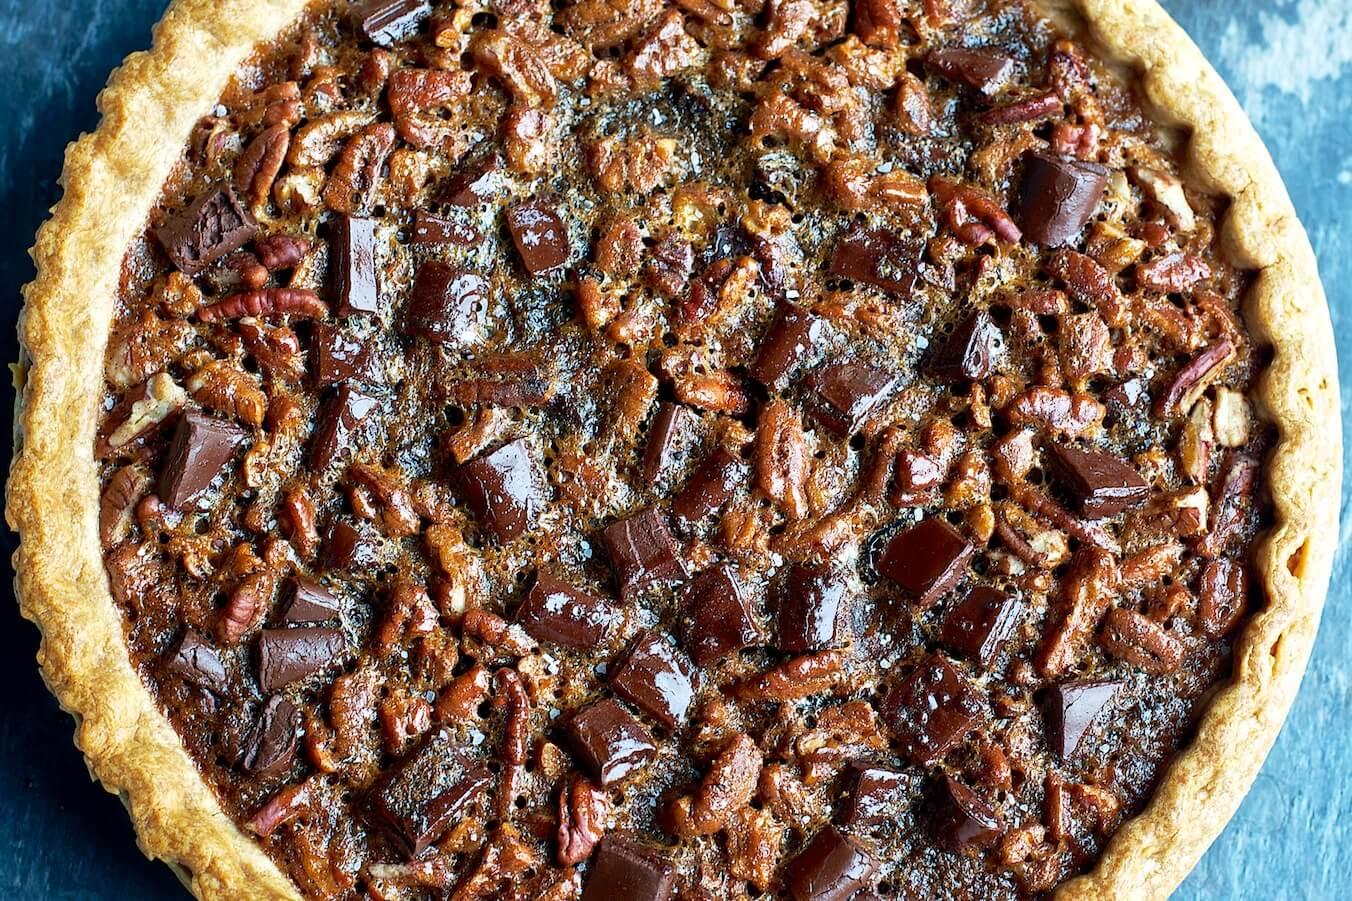 Pecan pie is a classic treat